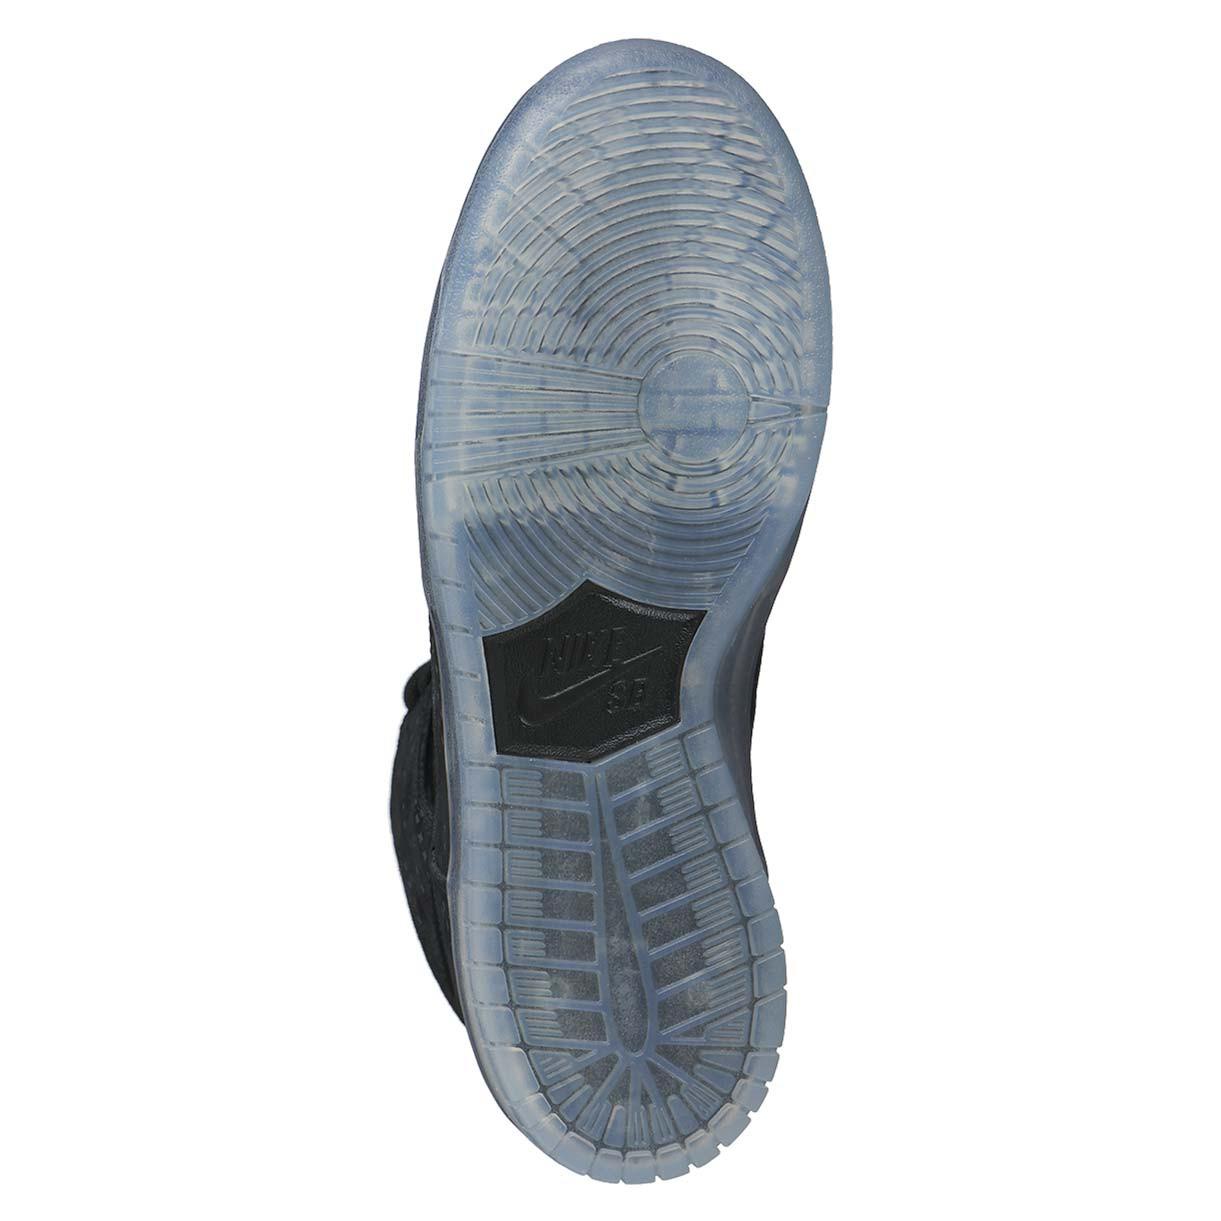 wholesale dealer 534b5 1e517 Nike SB Dunk High Premium Flash